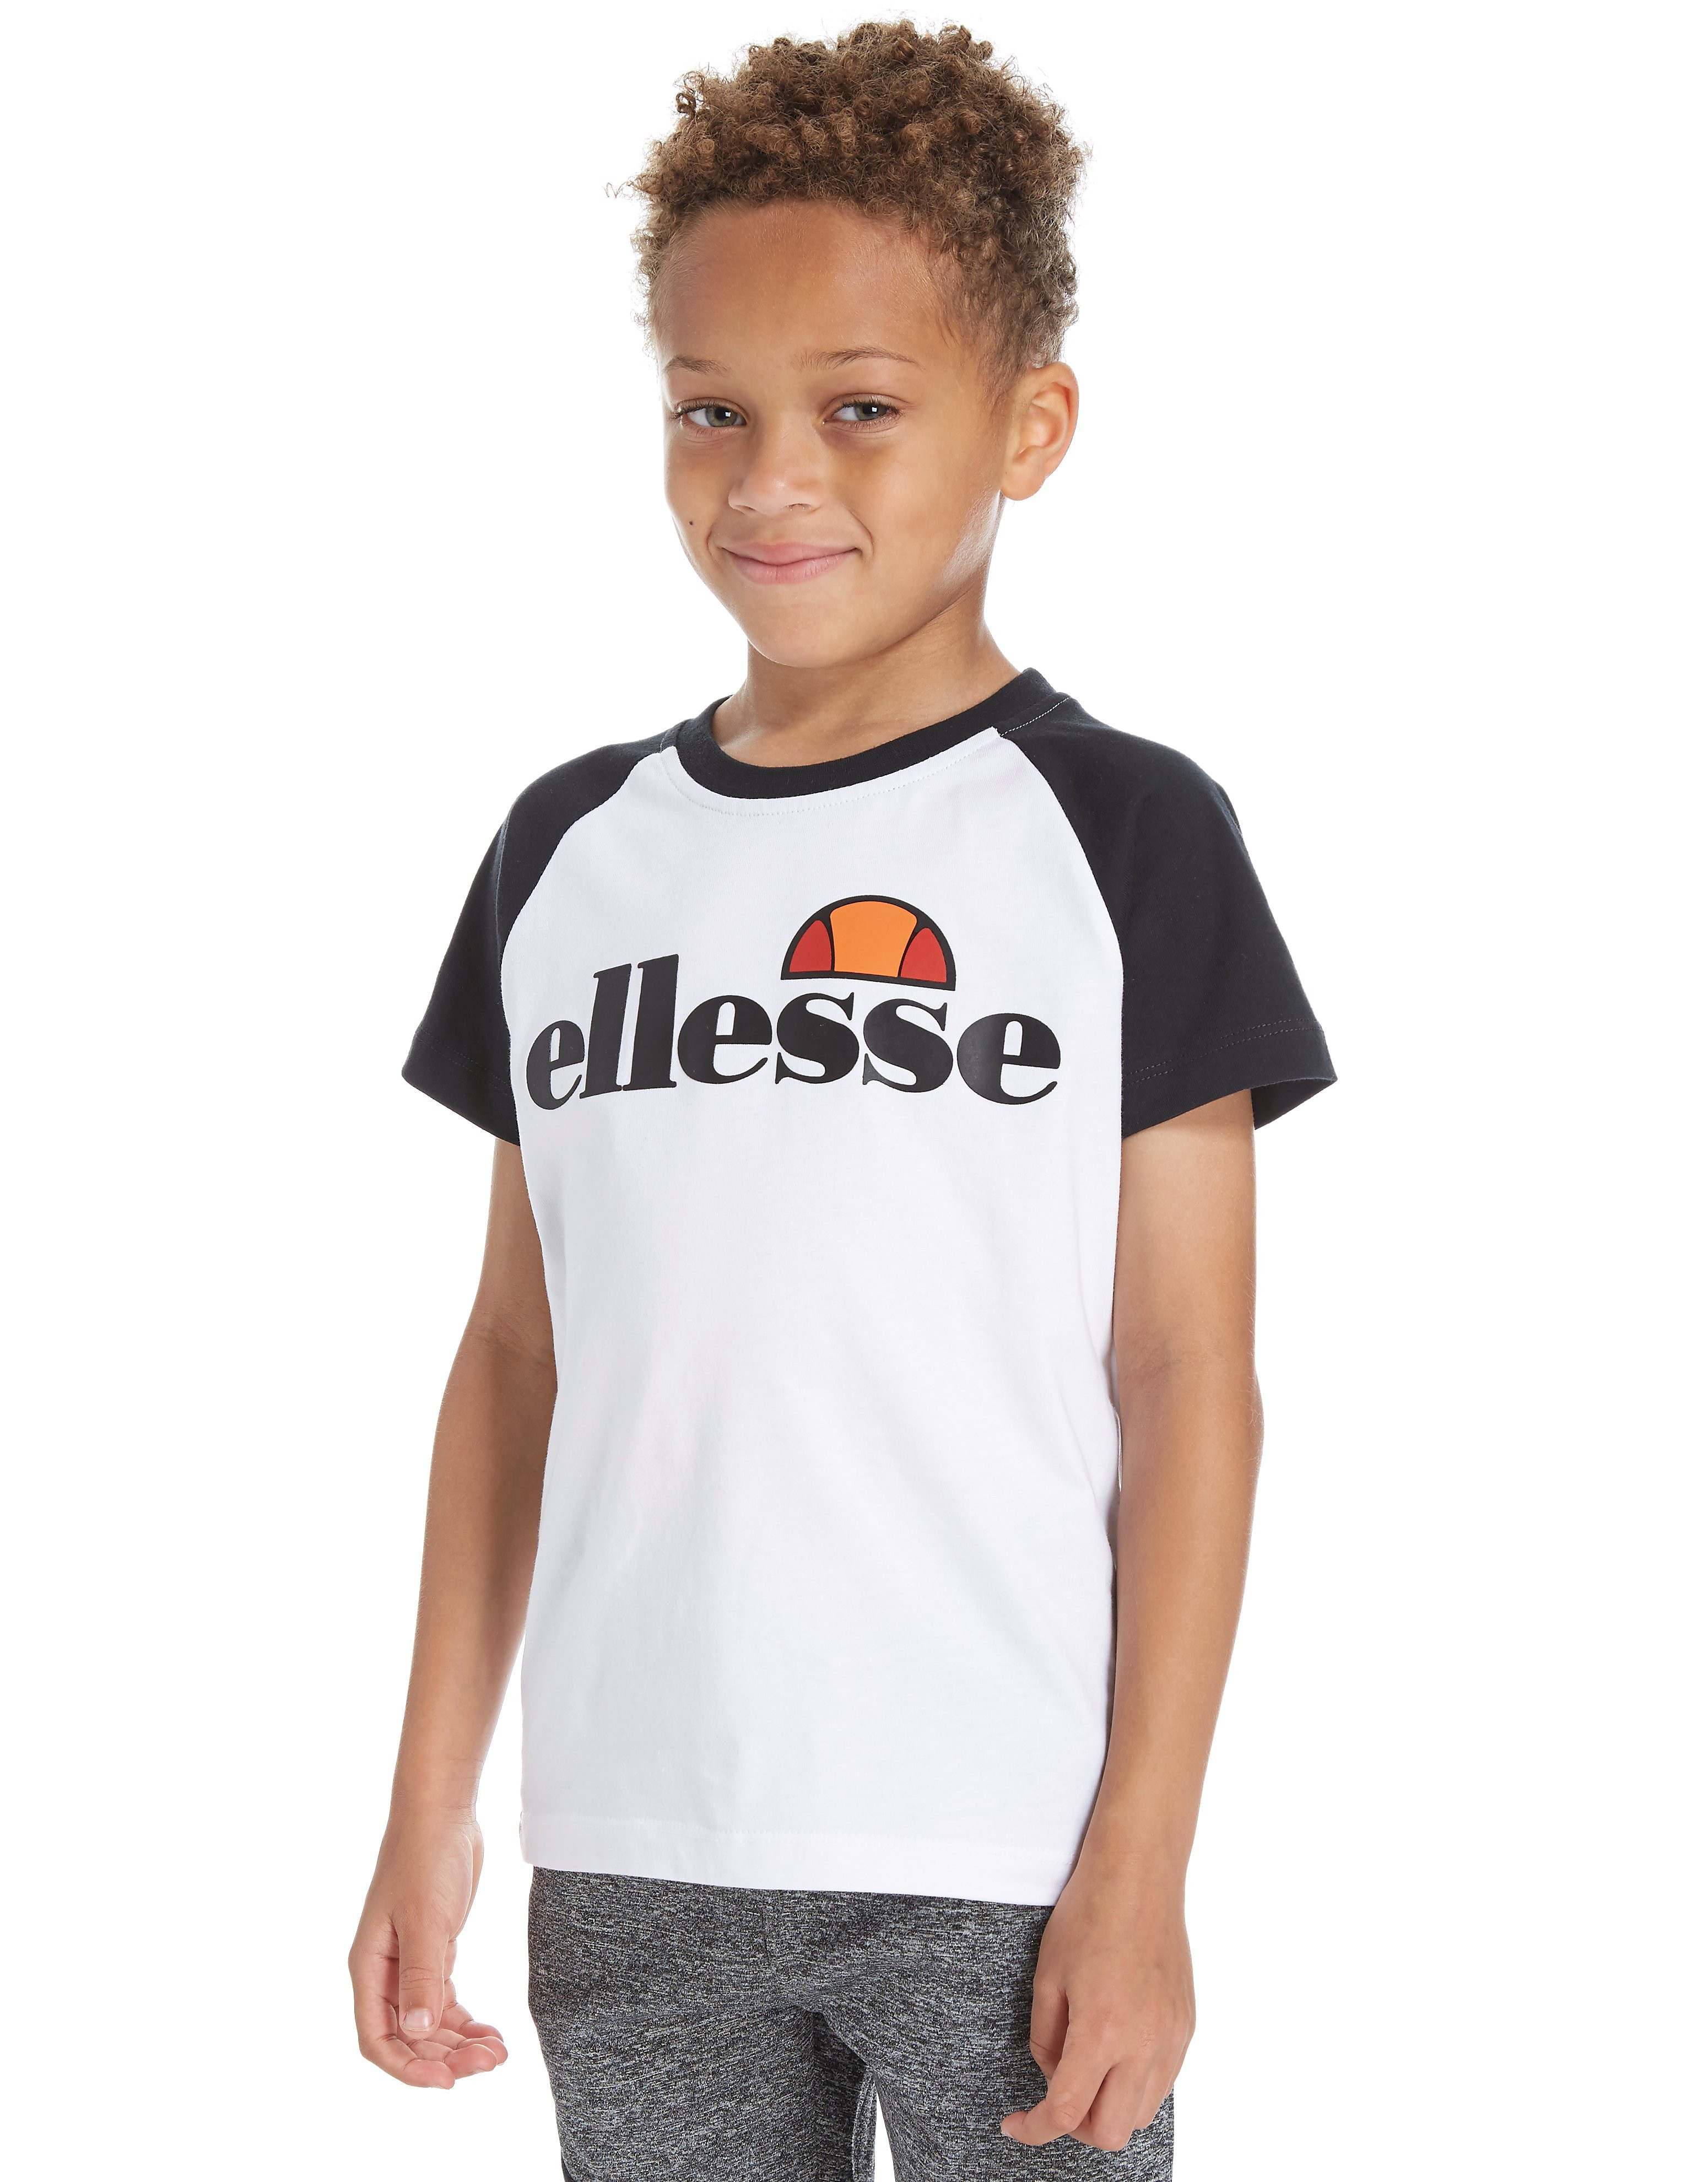 Ellesse Regino T-Shirt Children